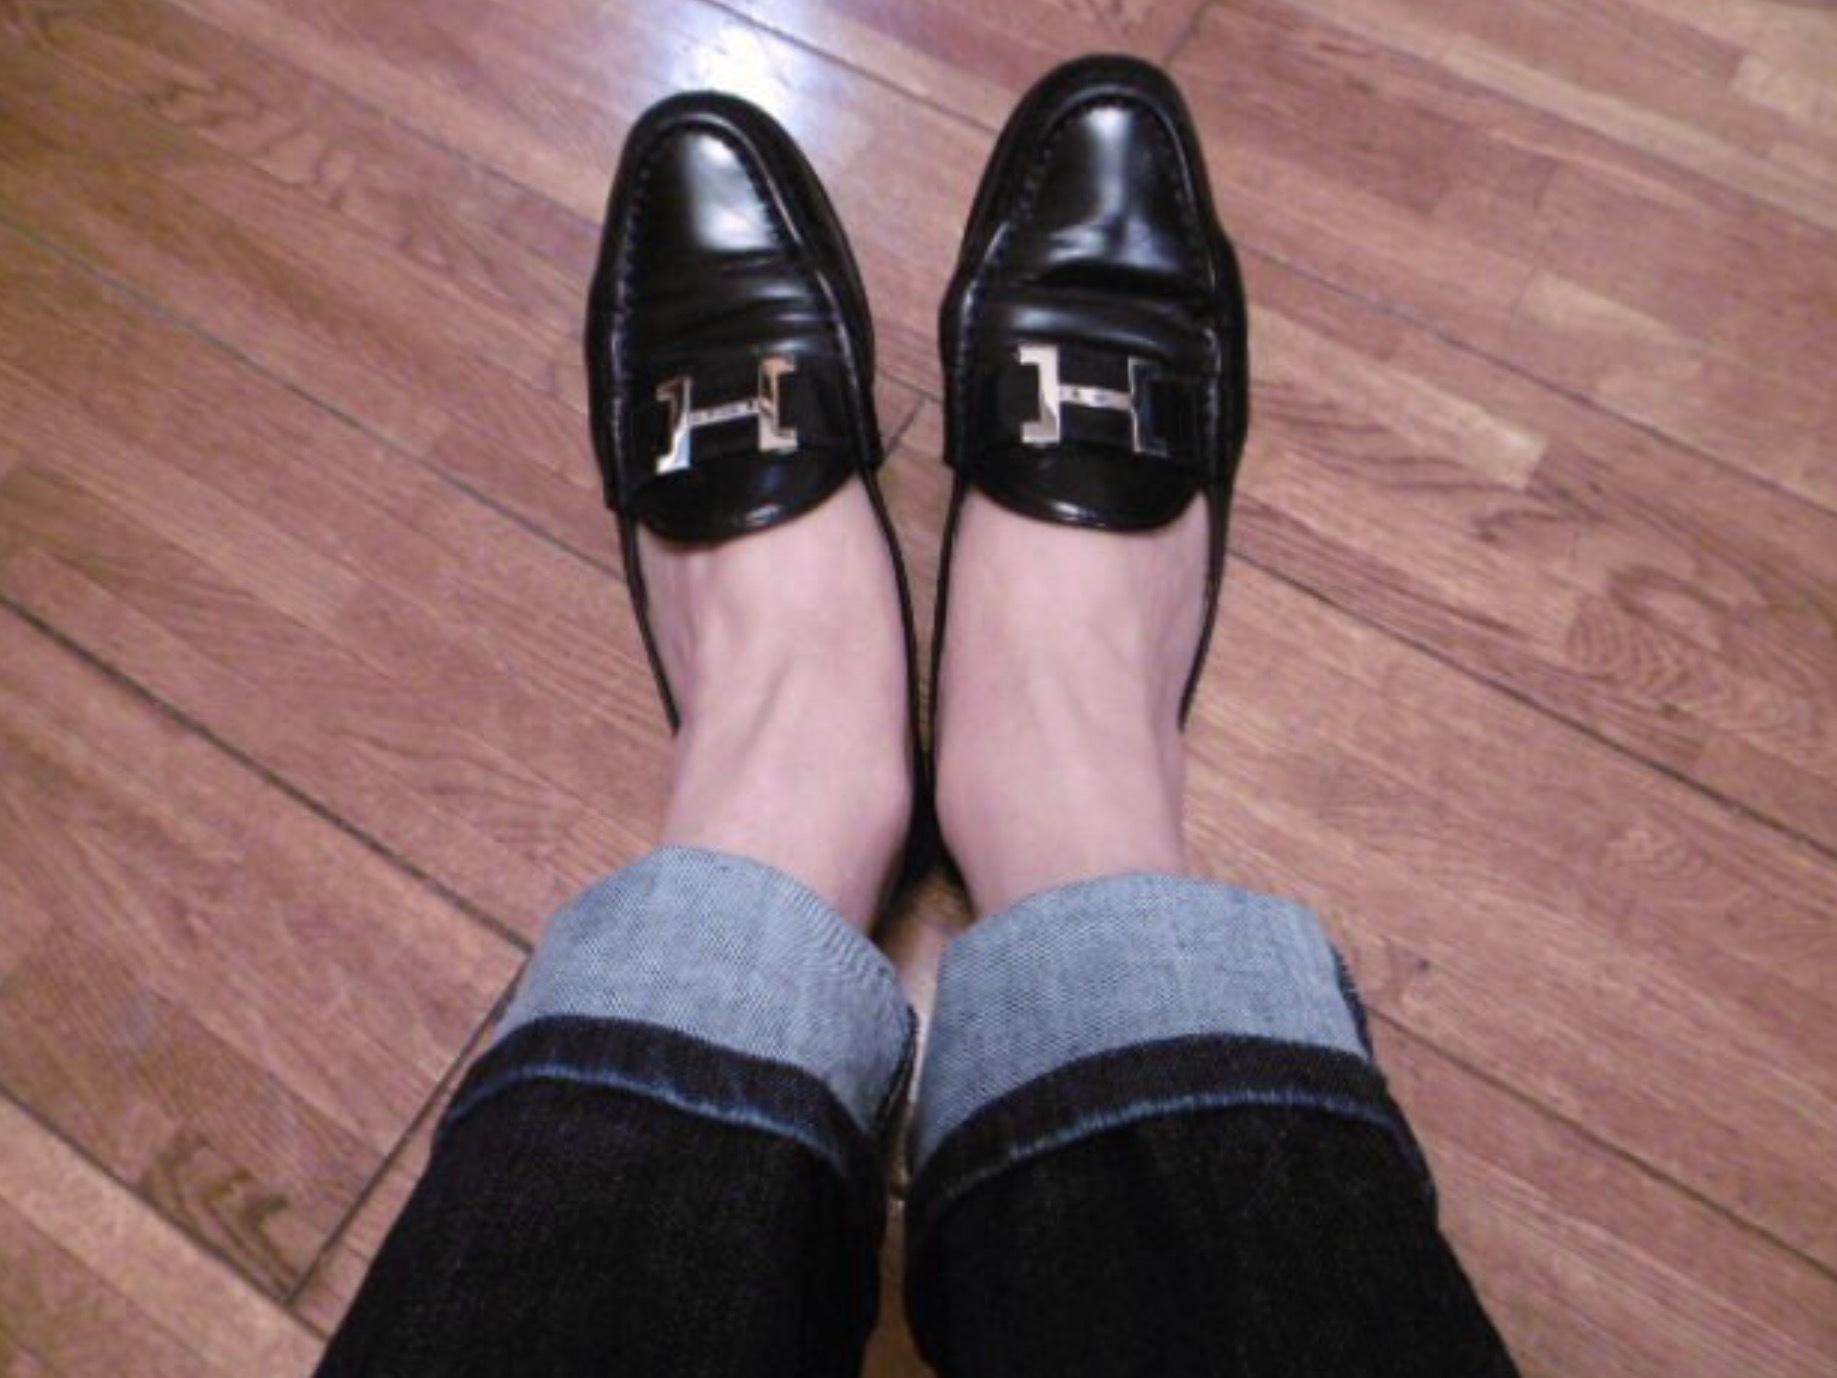 madameHの靴の変遷…紐靴とローファー_b0210699_23325099.jpeg